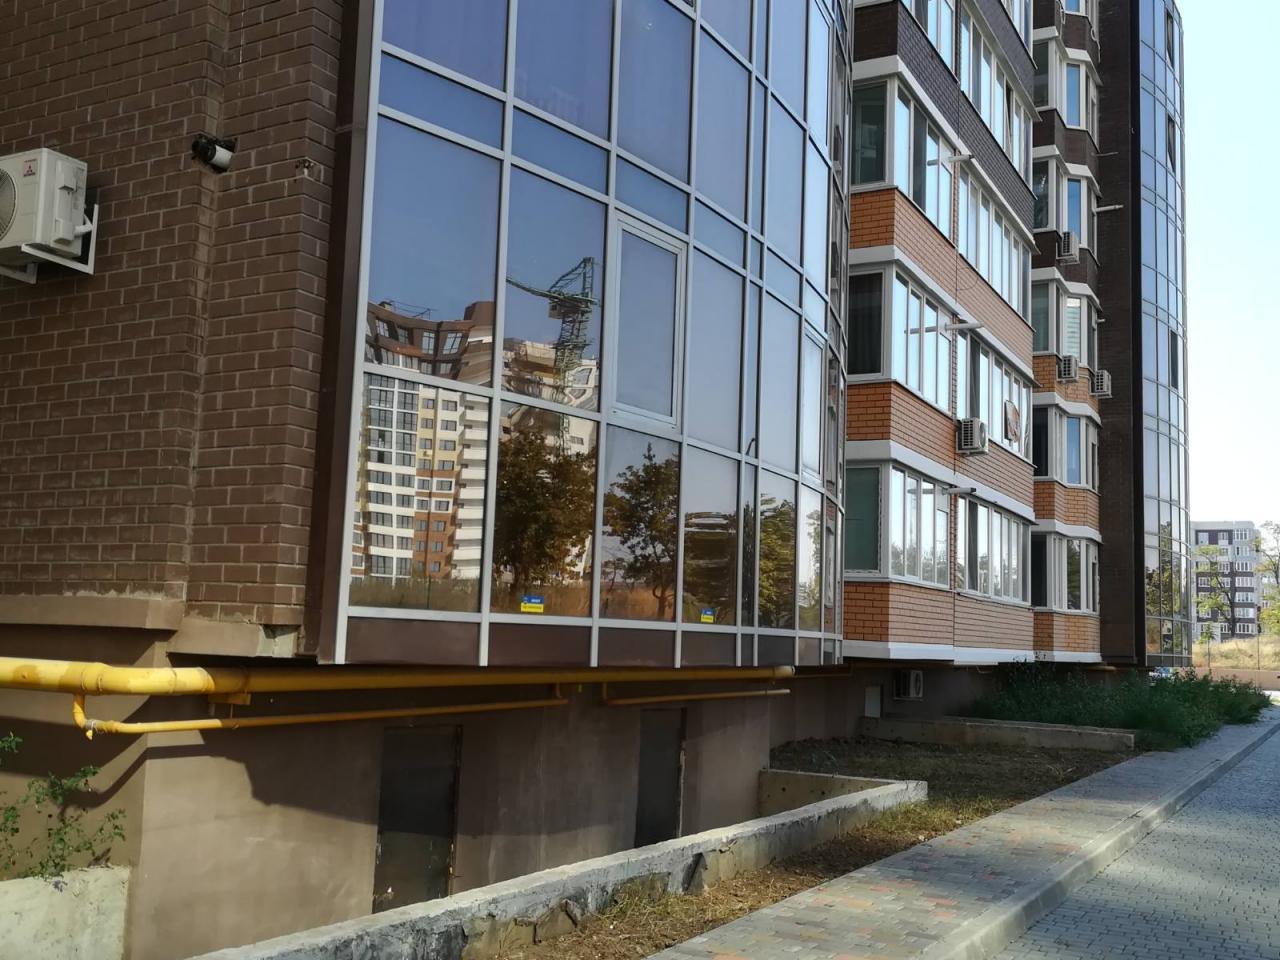 продажа офиса номер C-141246 в Суворовском районе, фото номер 2